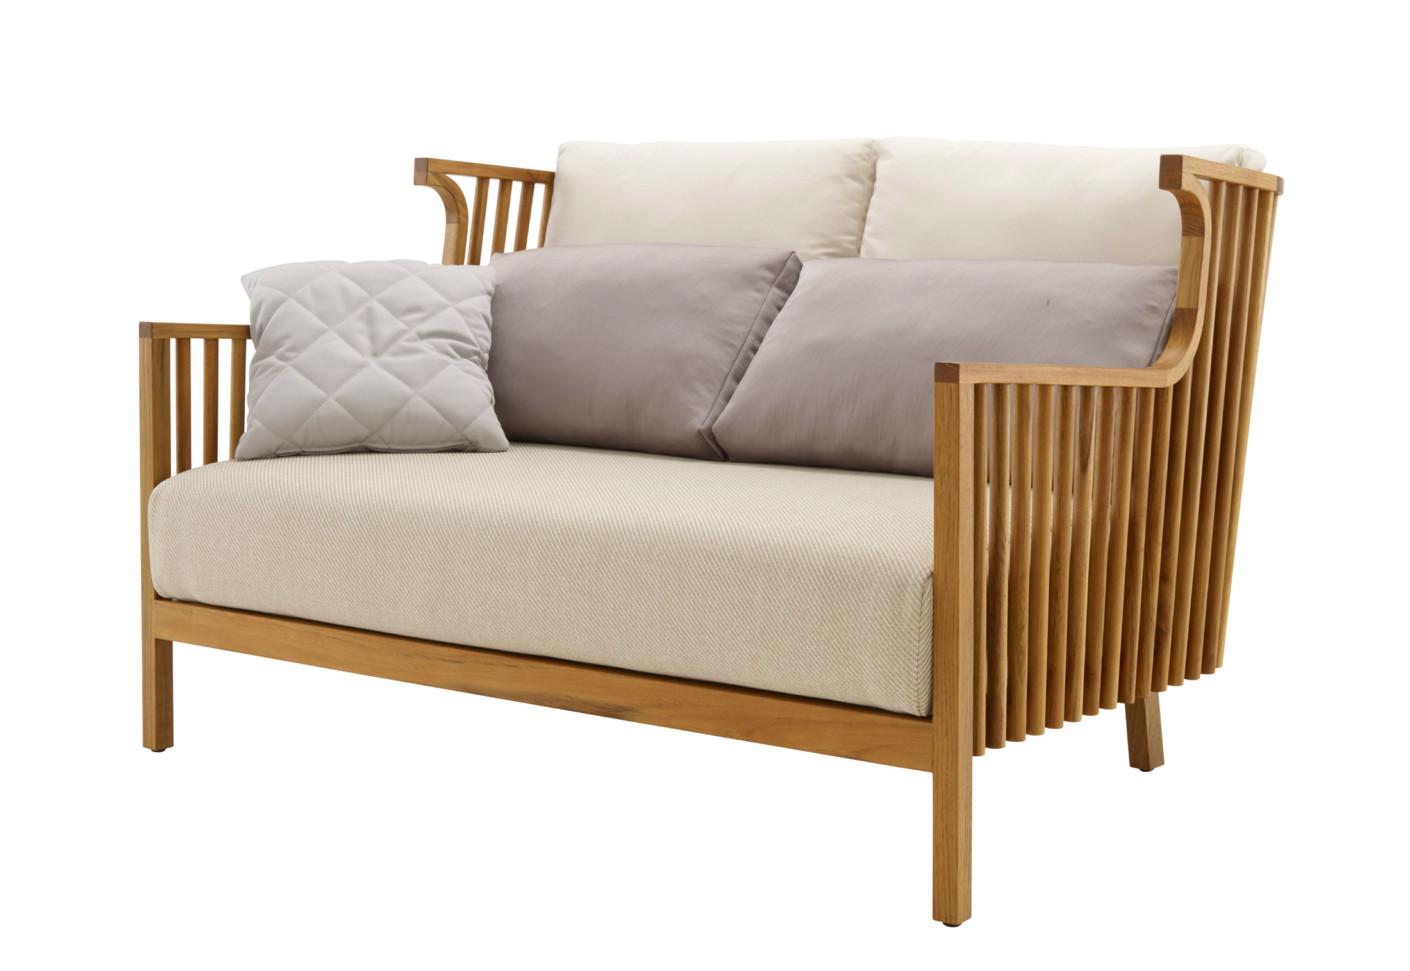 ELIZABETH TECK Sofa By Ligne Roset